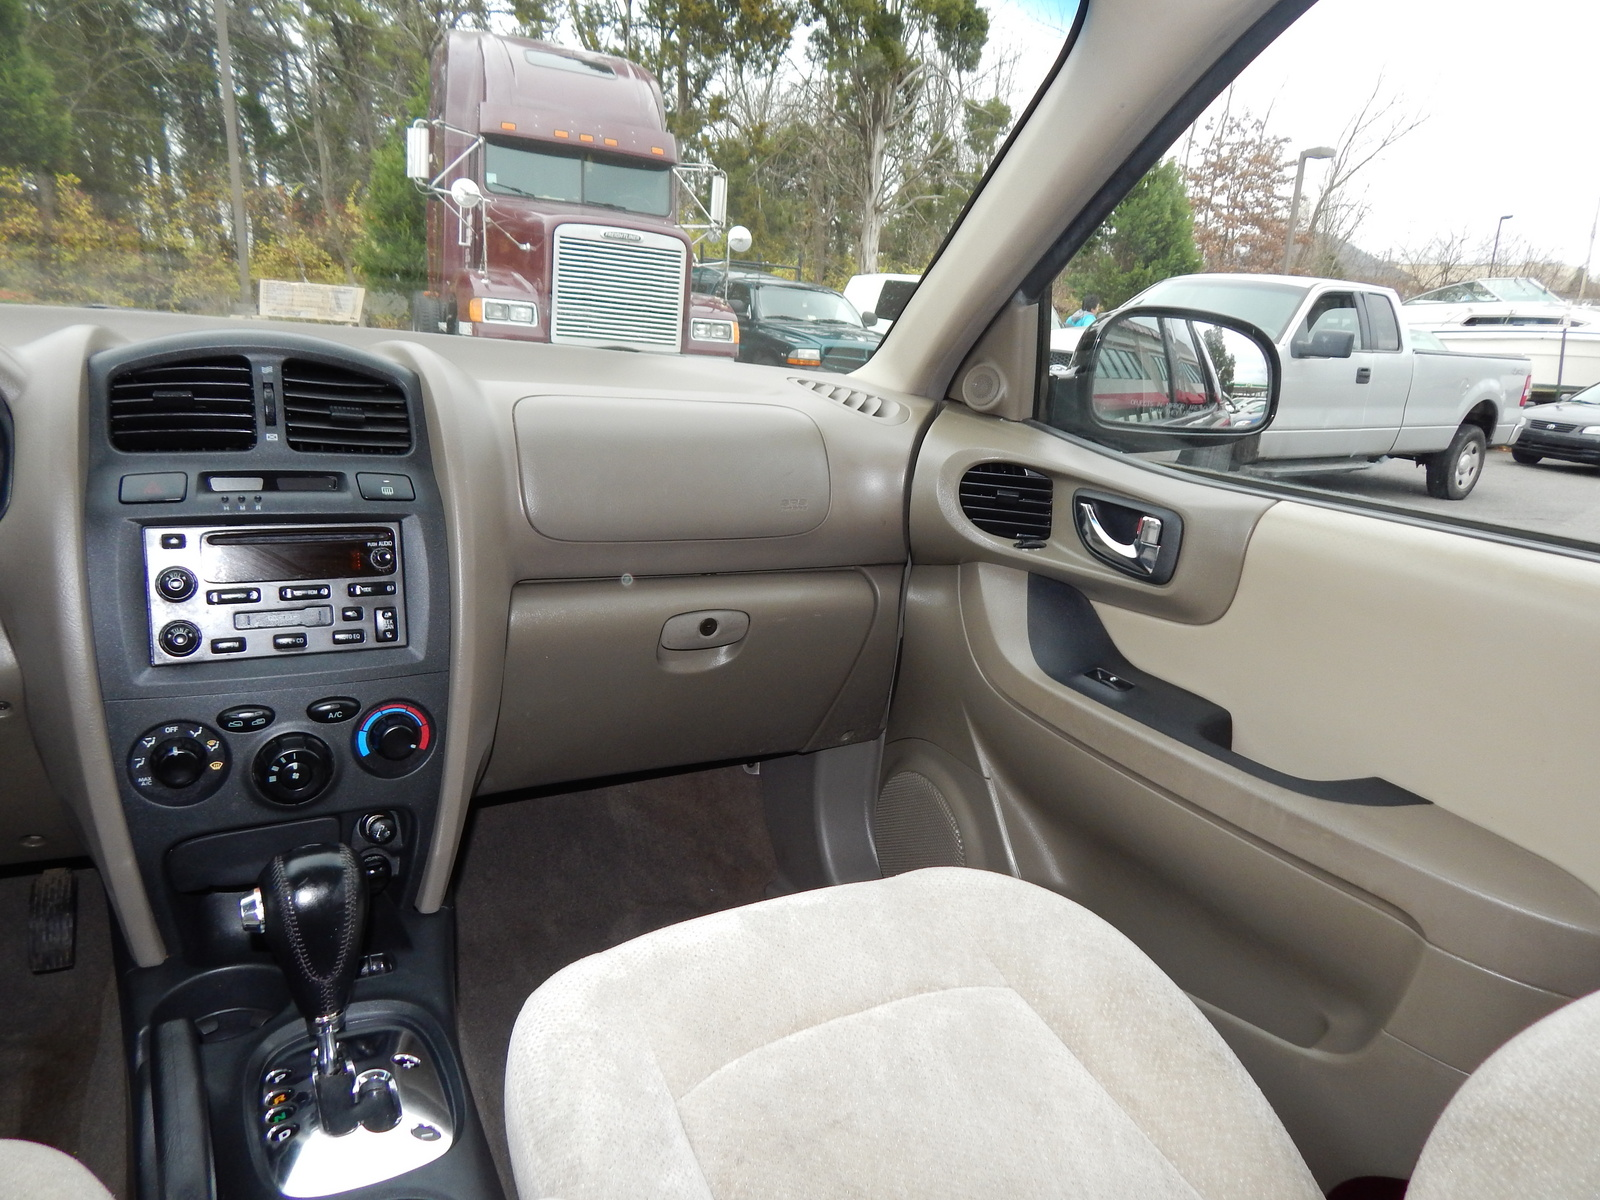 2005 hyundai santa fe interior car interior design